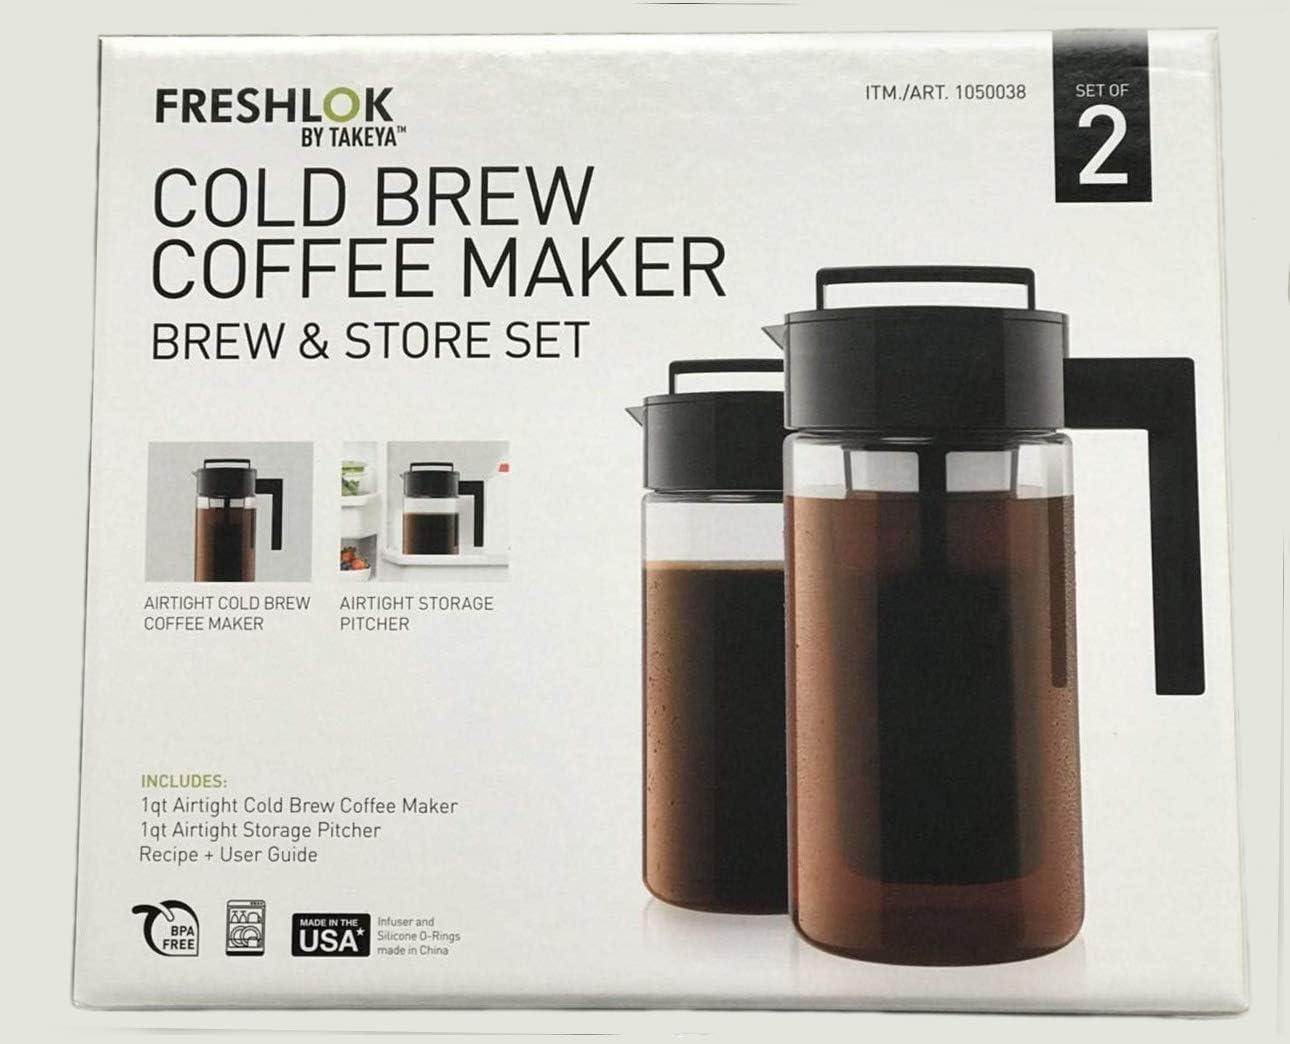 Takeya Cold Brew Iced Coffee Maker, 1-Quart, Black (2)